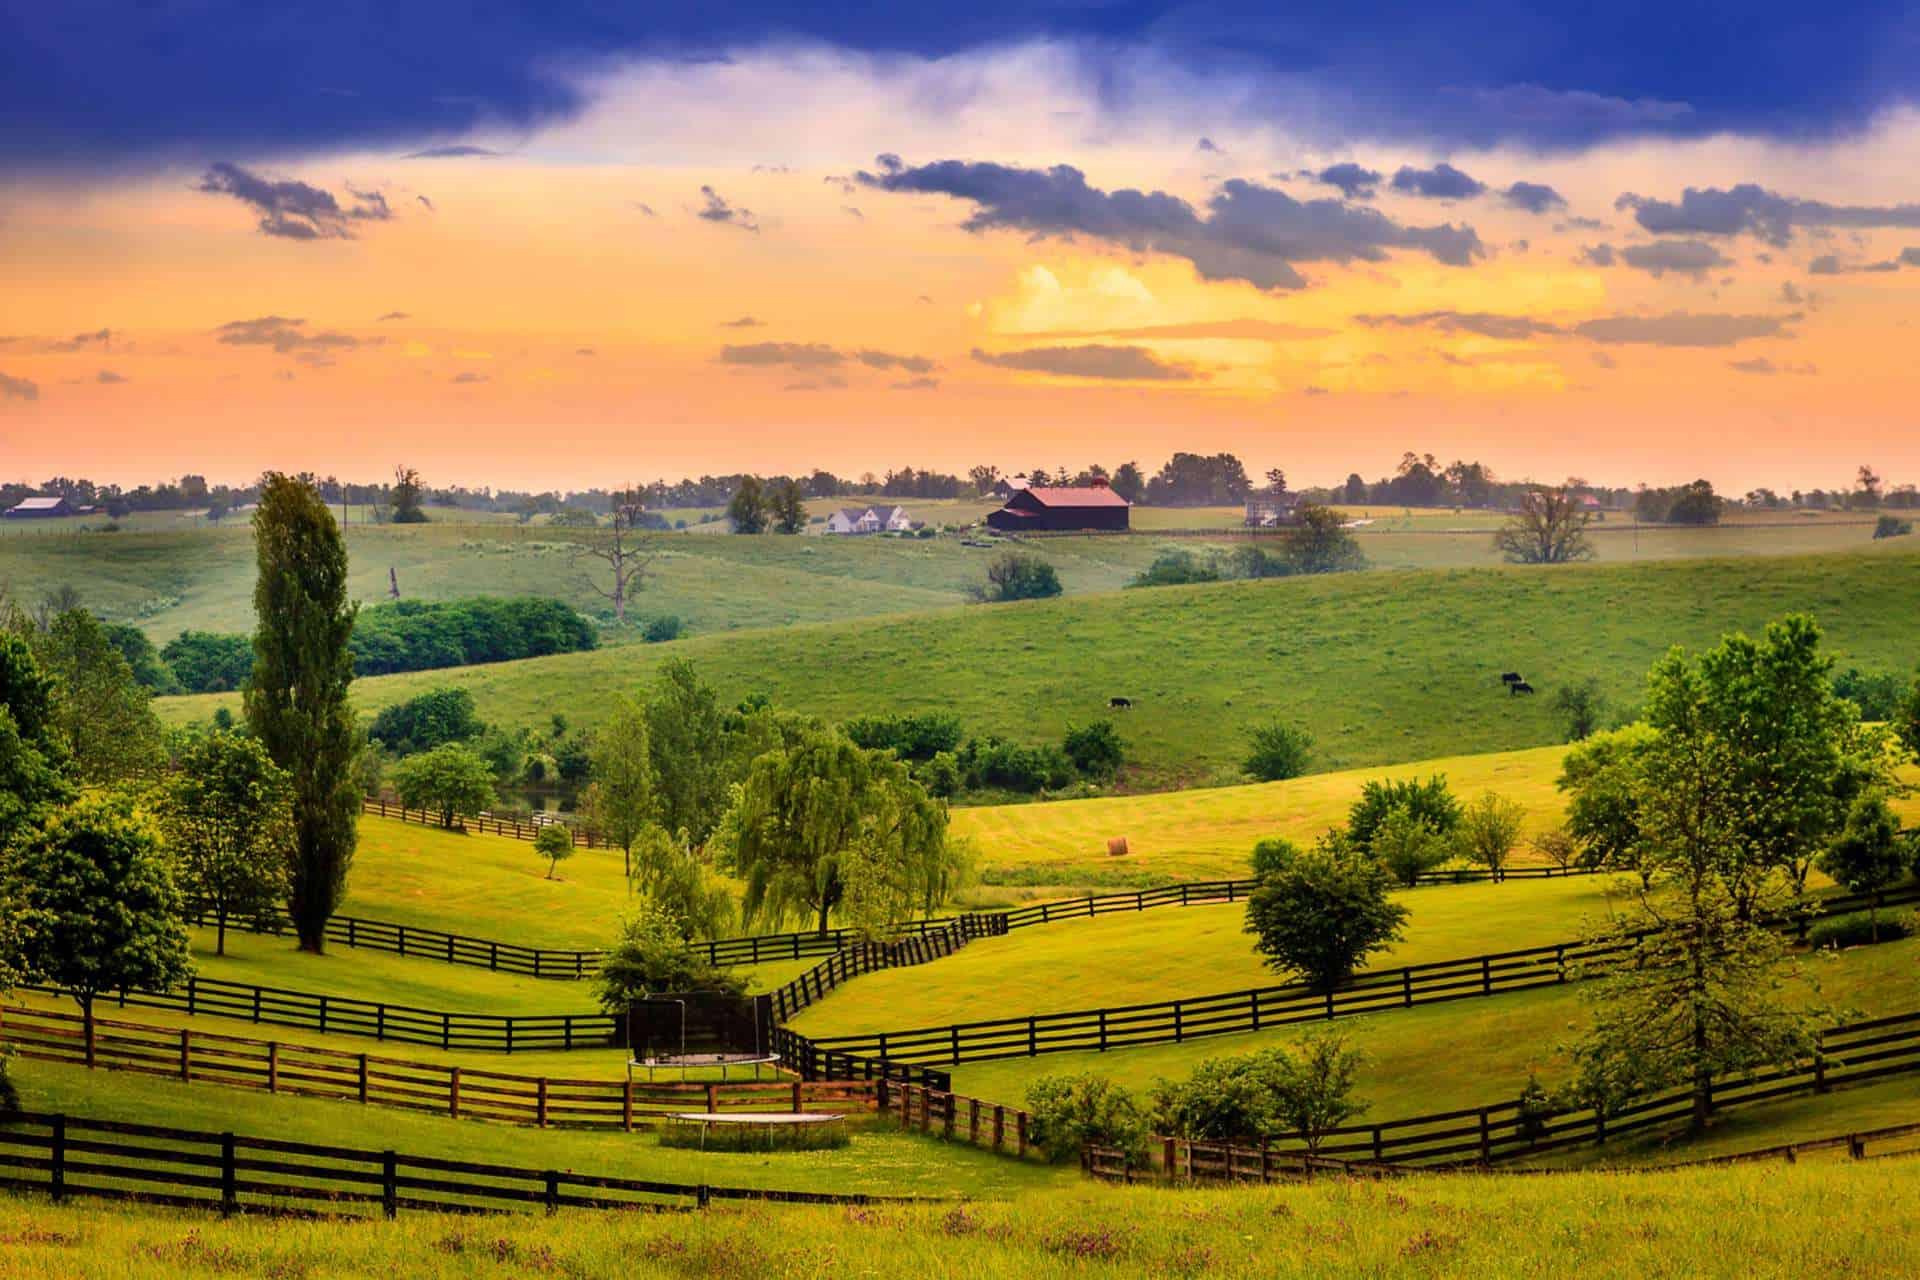 Where to Buy CBD Oil in Kentucky?